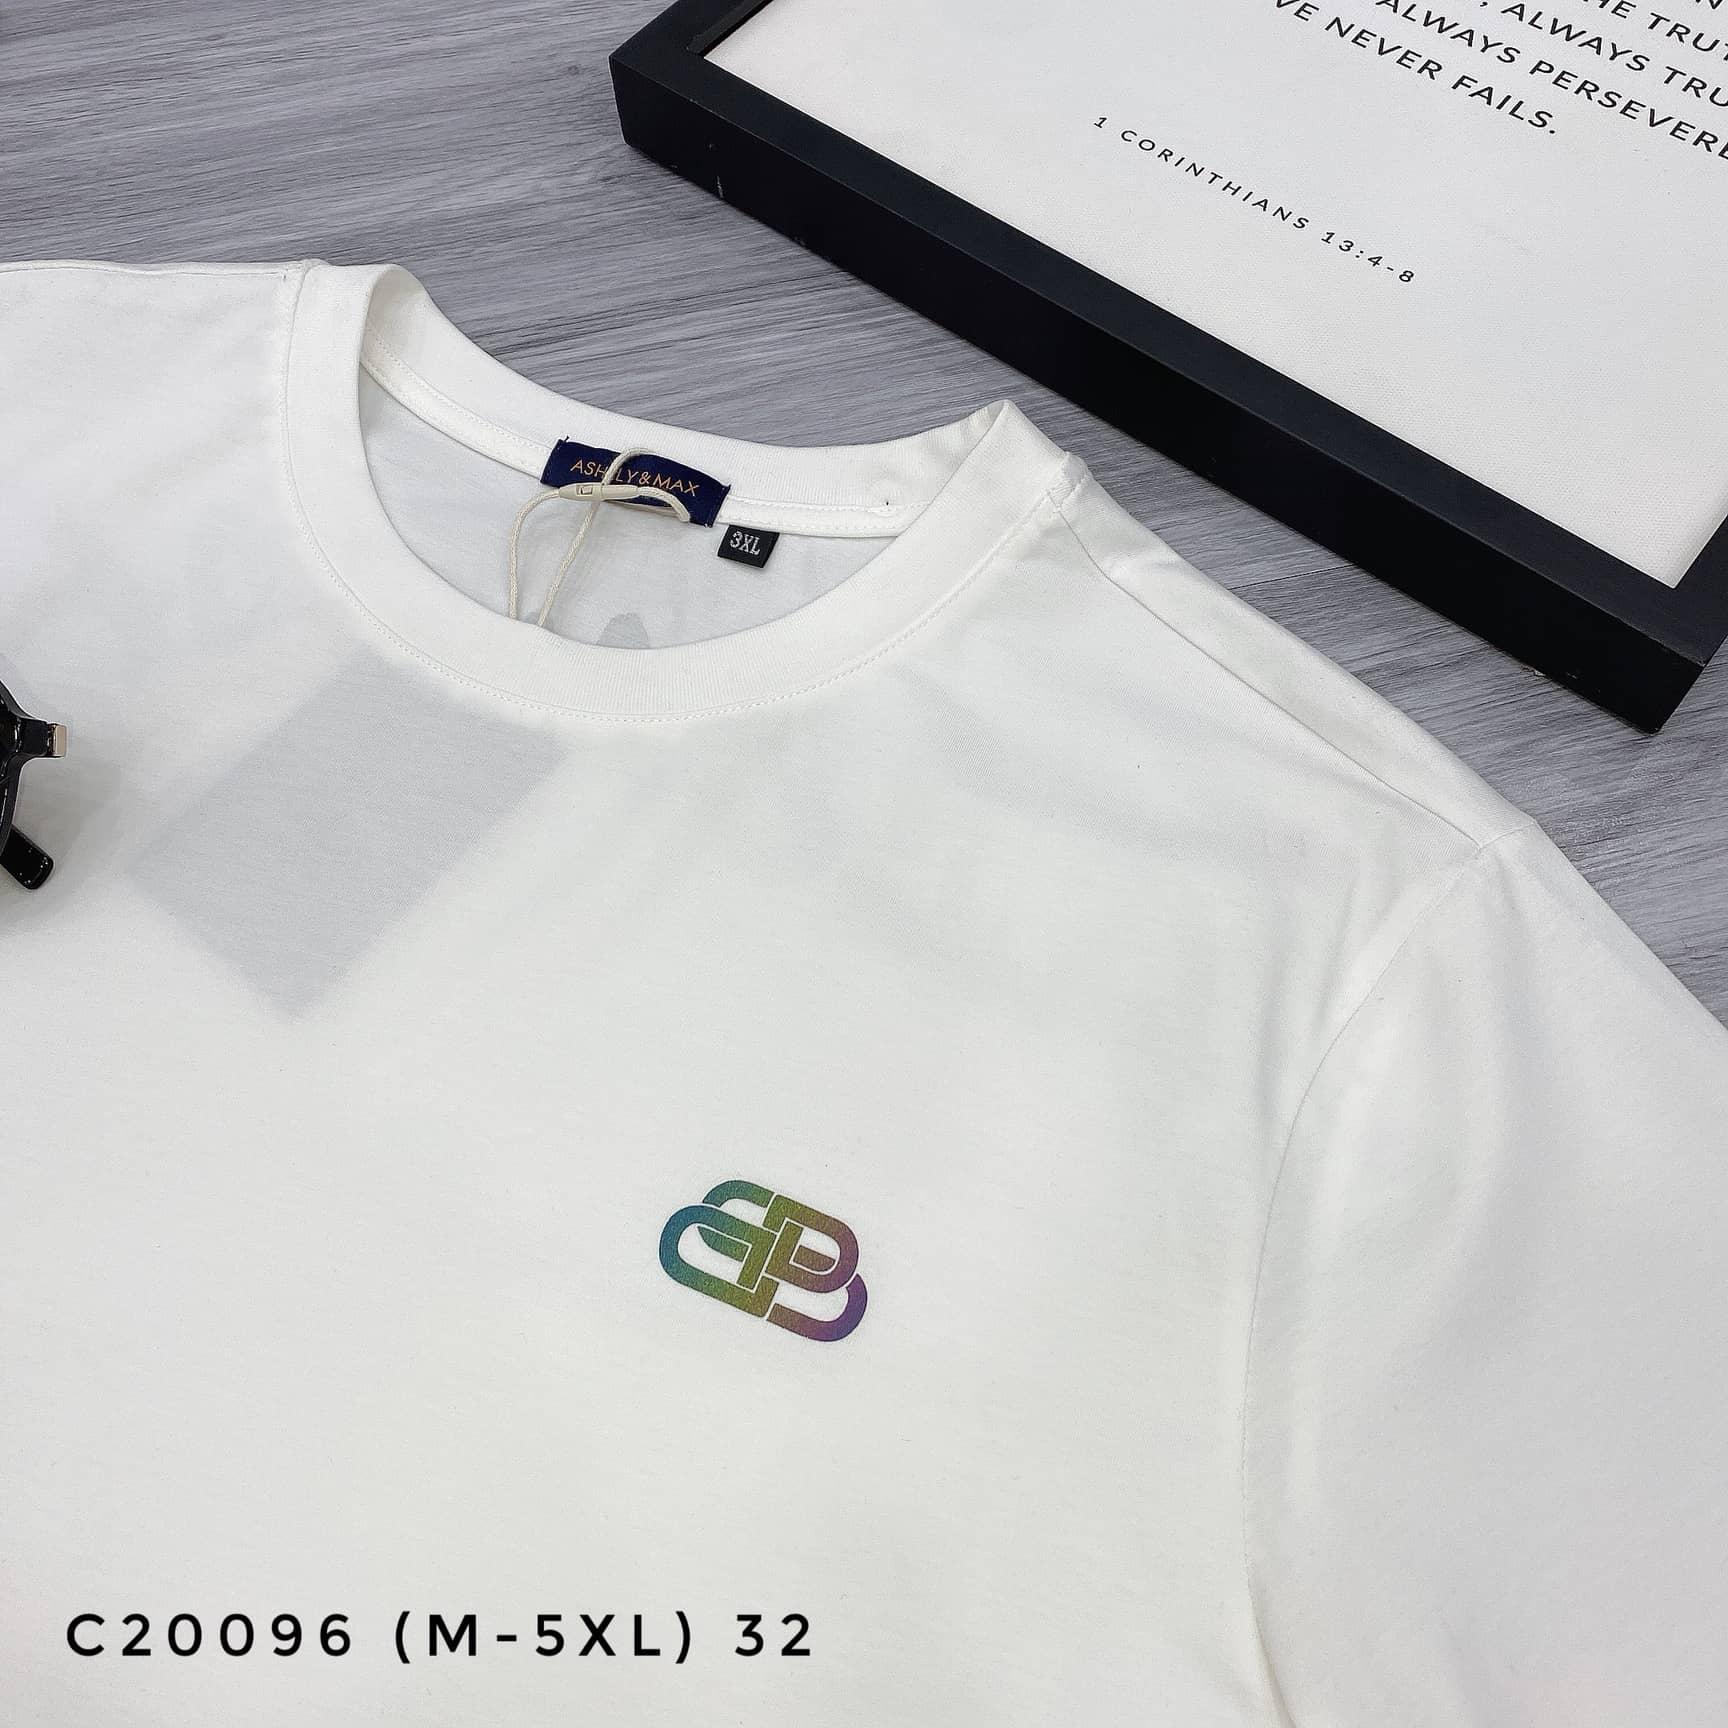 AT CỔ TRÒN C20096 (M-5XL)